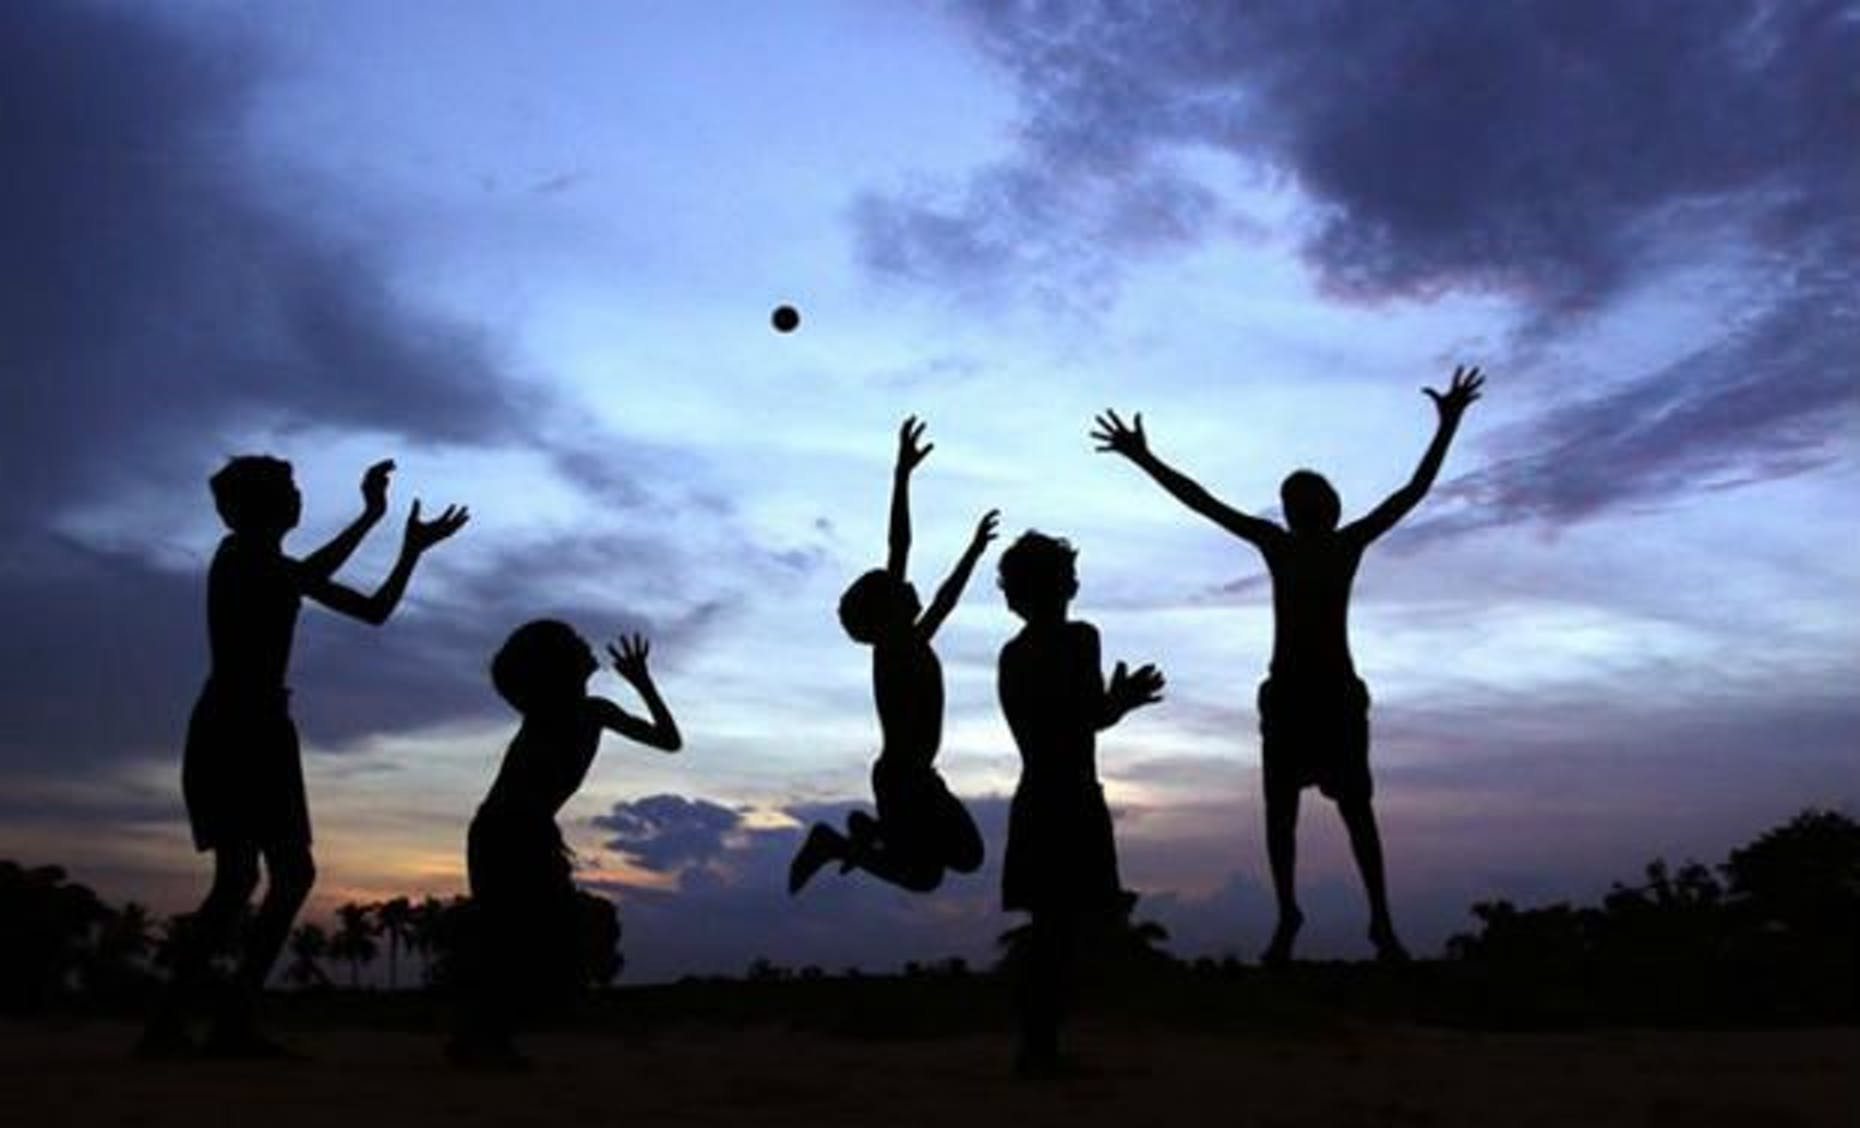 Bambini di Bhubaneswar, India - ©AP/Biswaranjan Rout